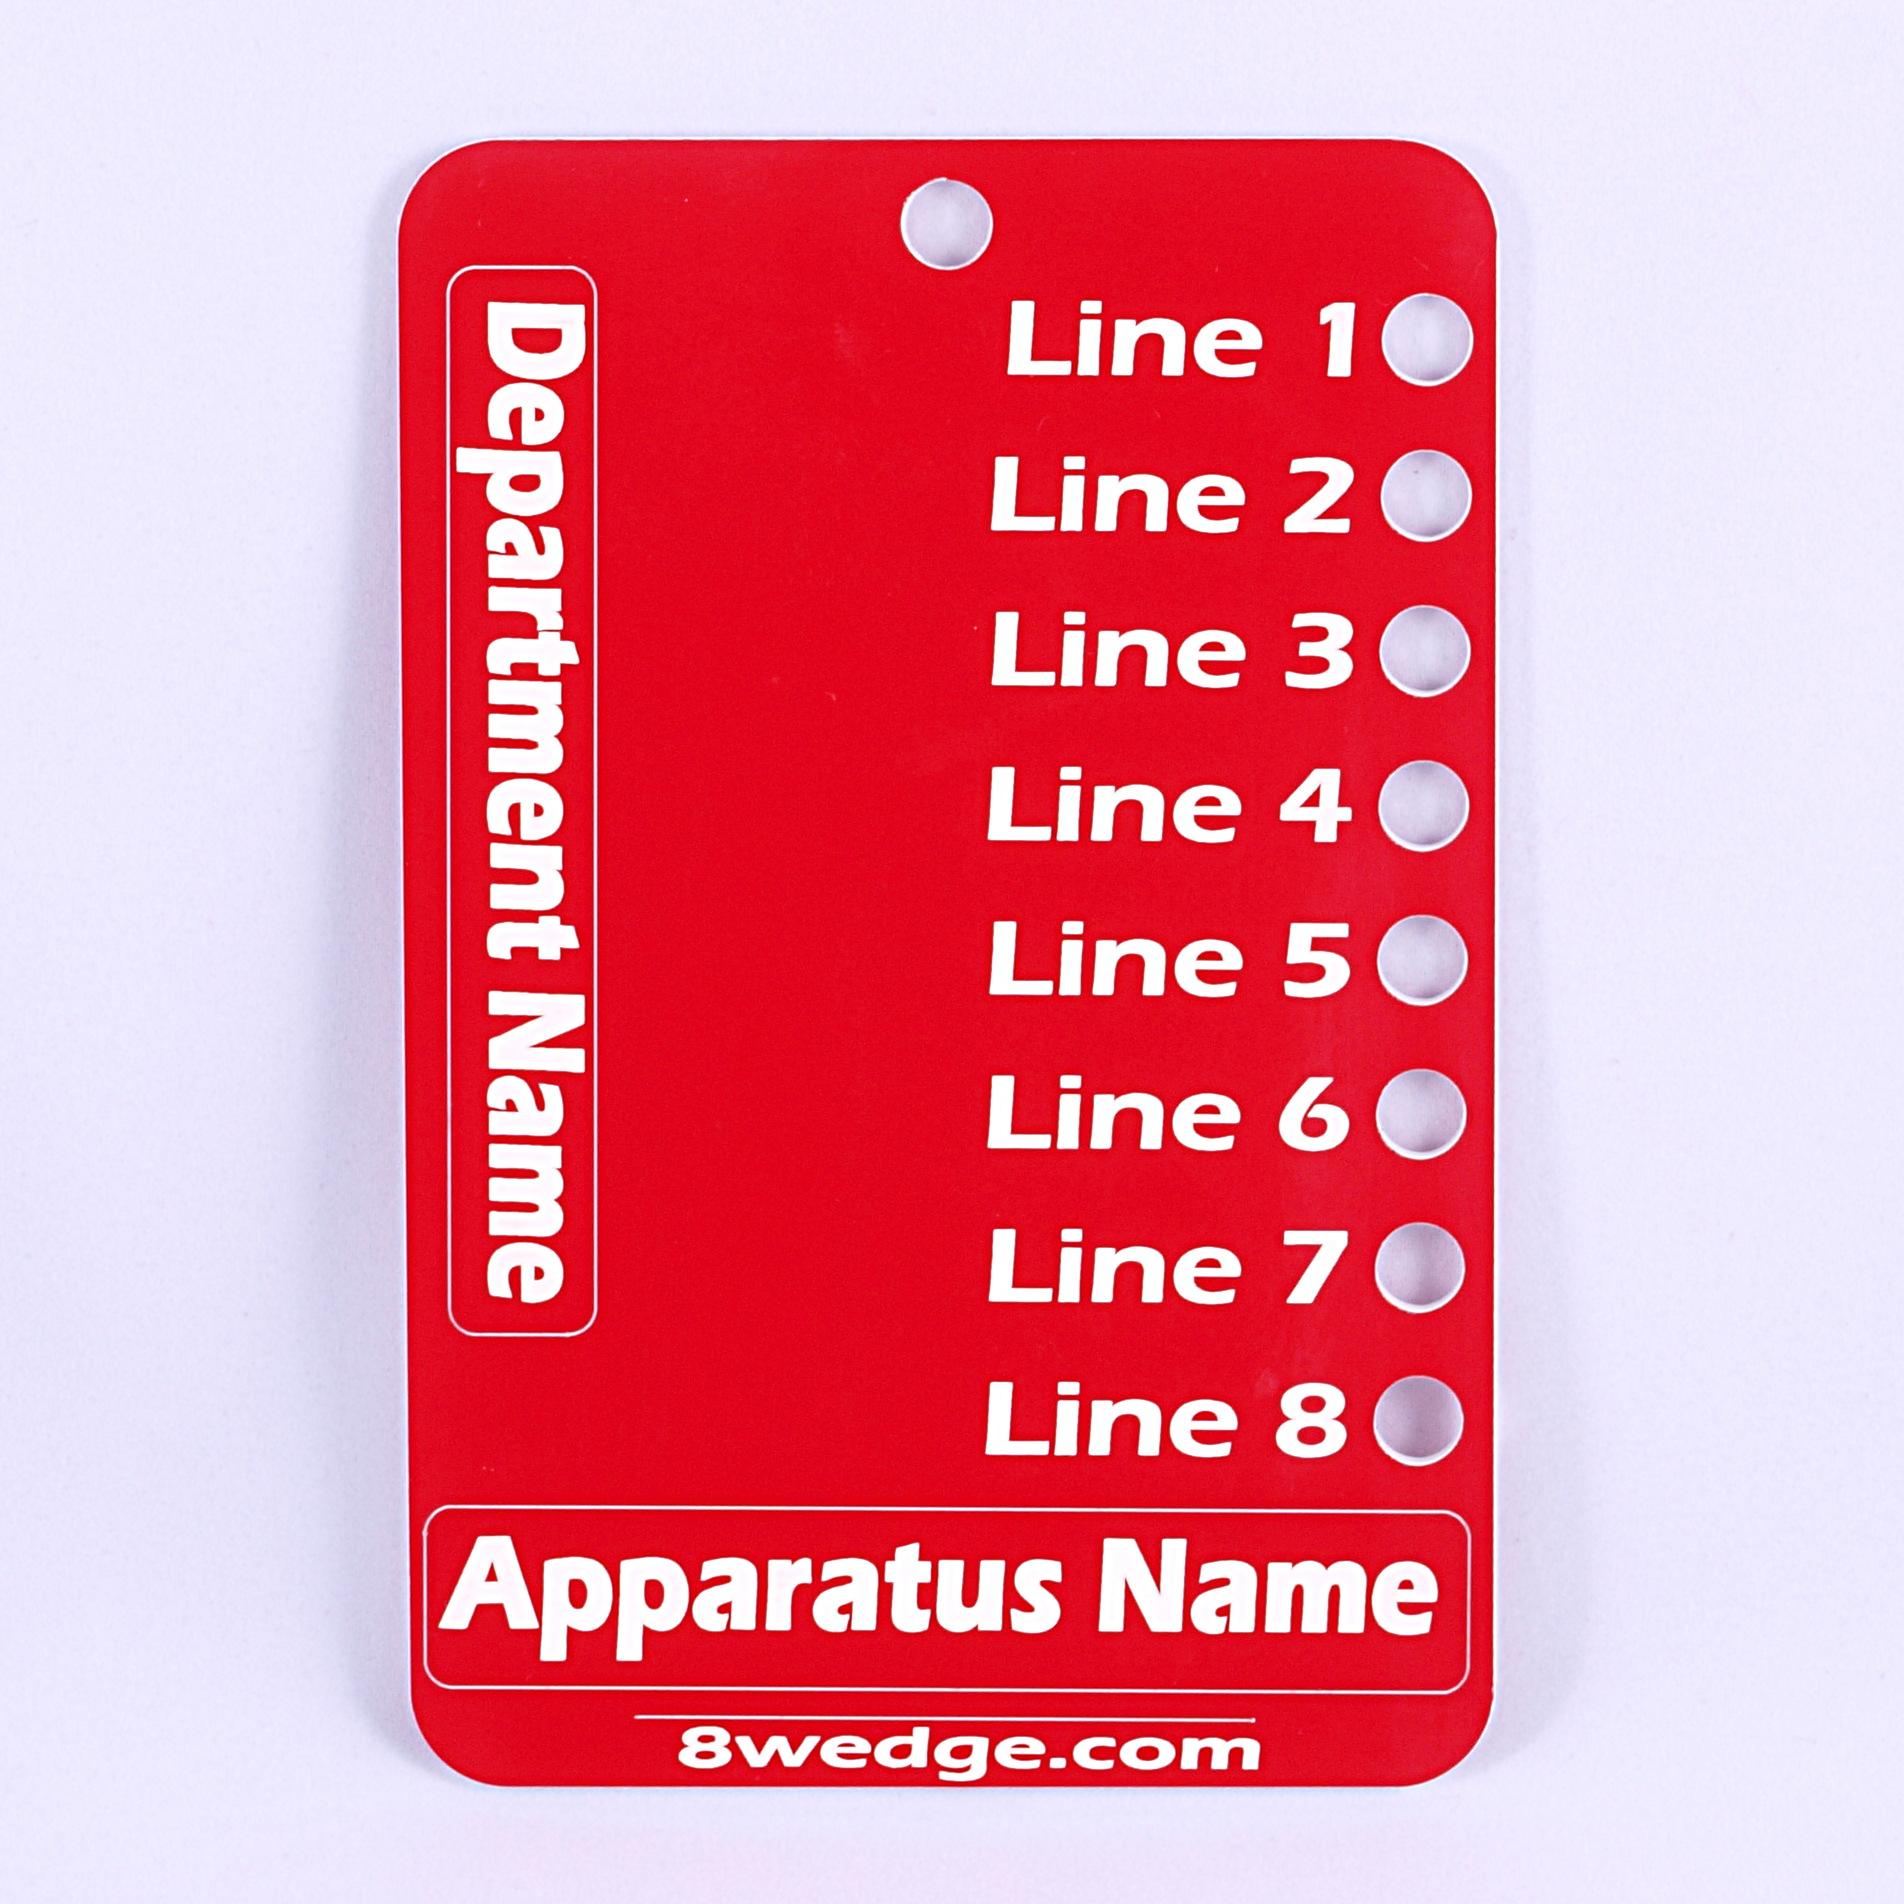 Apparatus Tag_Large.jpg